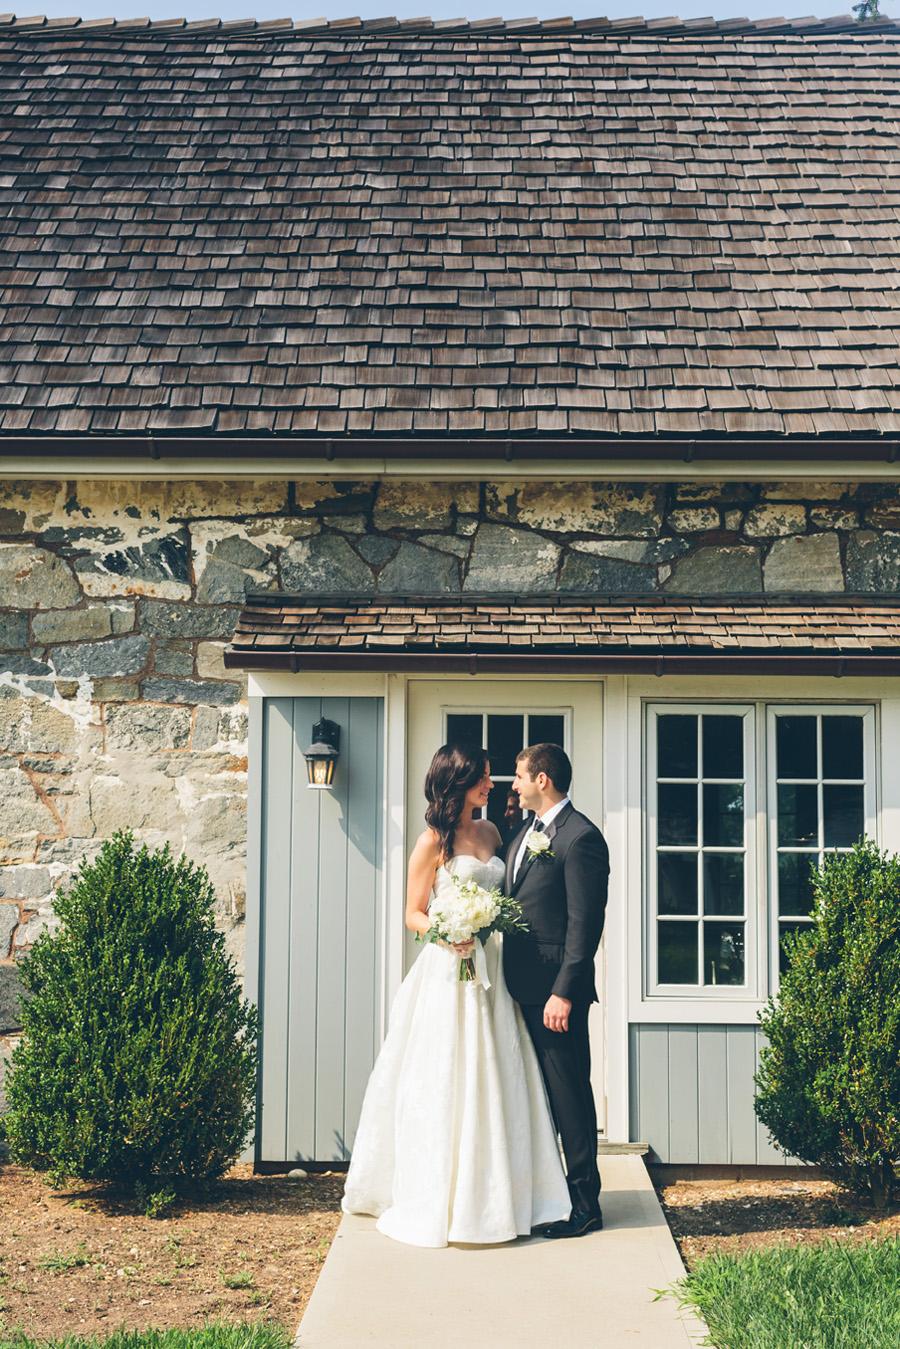 VICTORIA-BRIAN-NY-WEDDING-BRIDEGROOM-CYNTHIACHUNG-0129.jpg